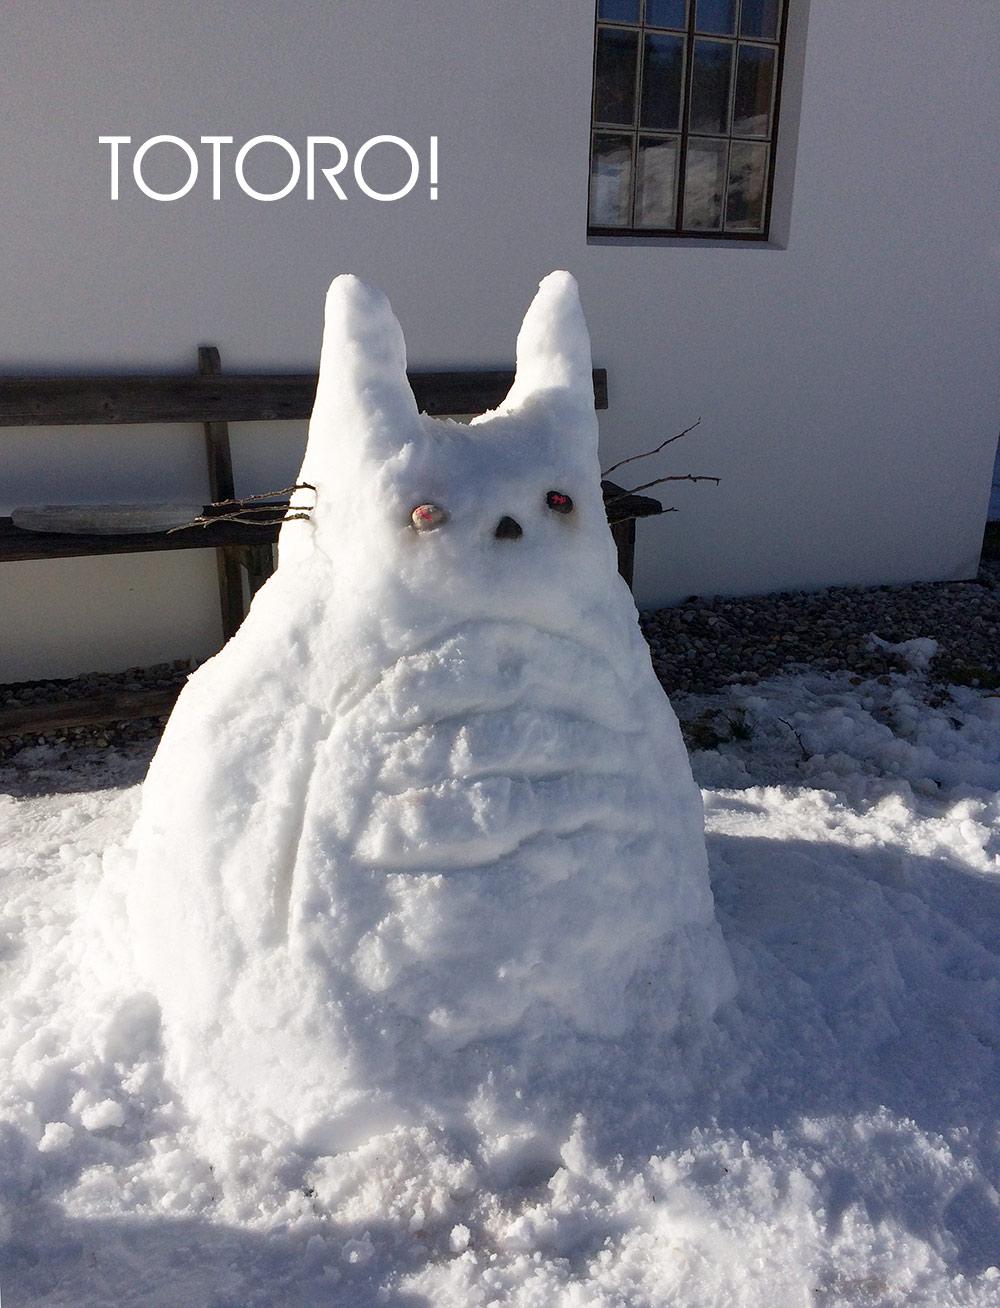 schnee-totoro